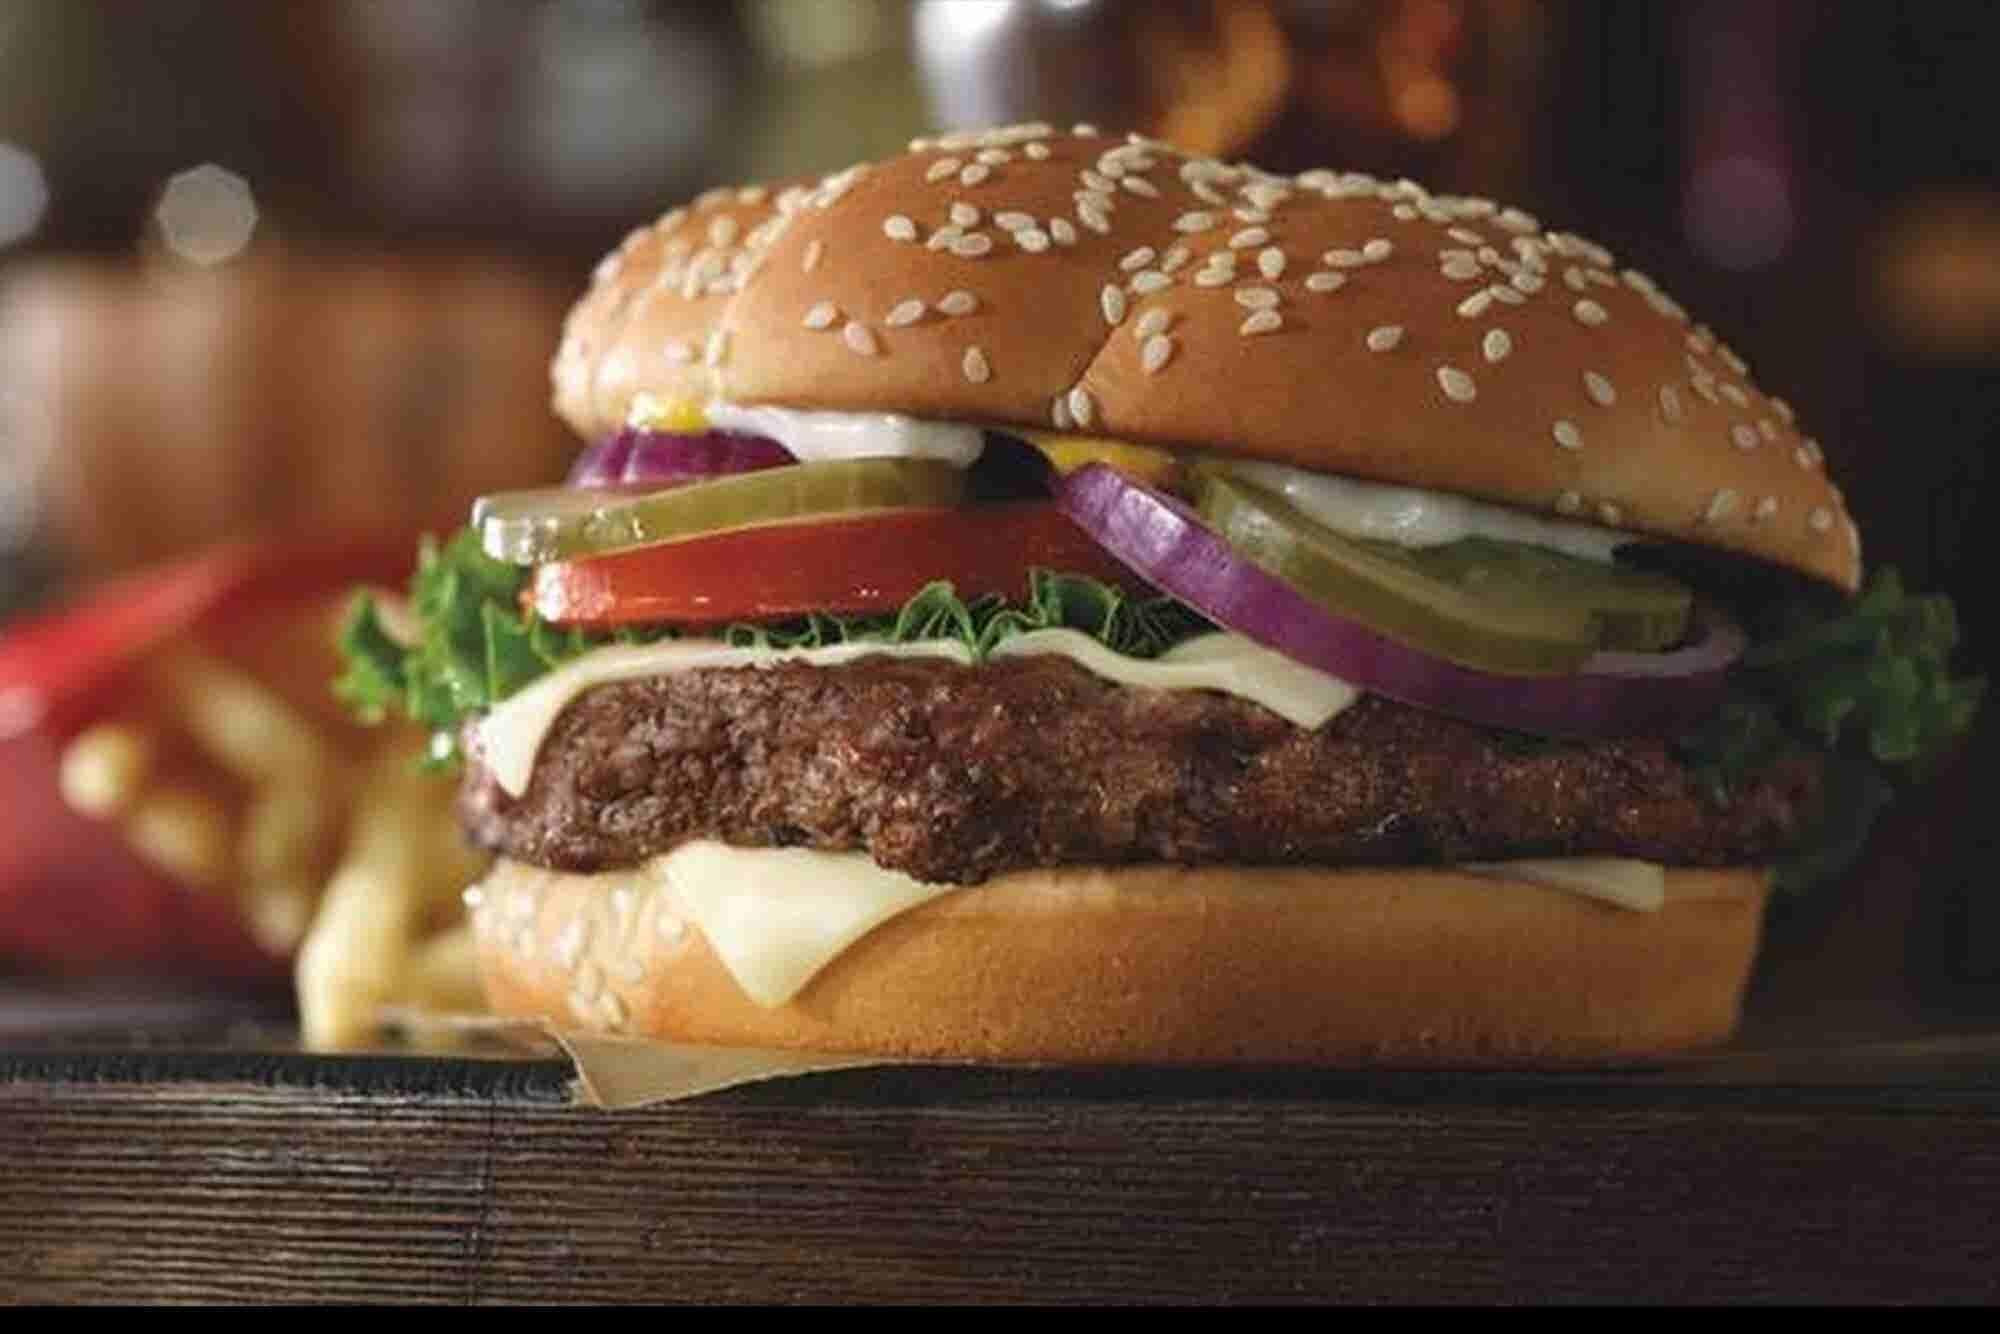 McDonald's Brings Back Bigger, More Expensive Burger